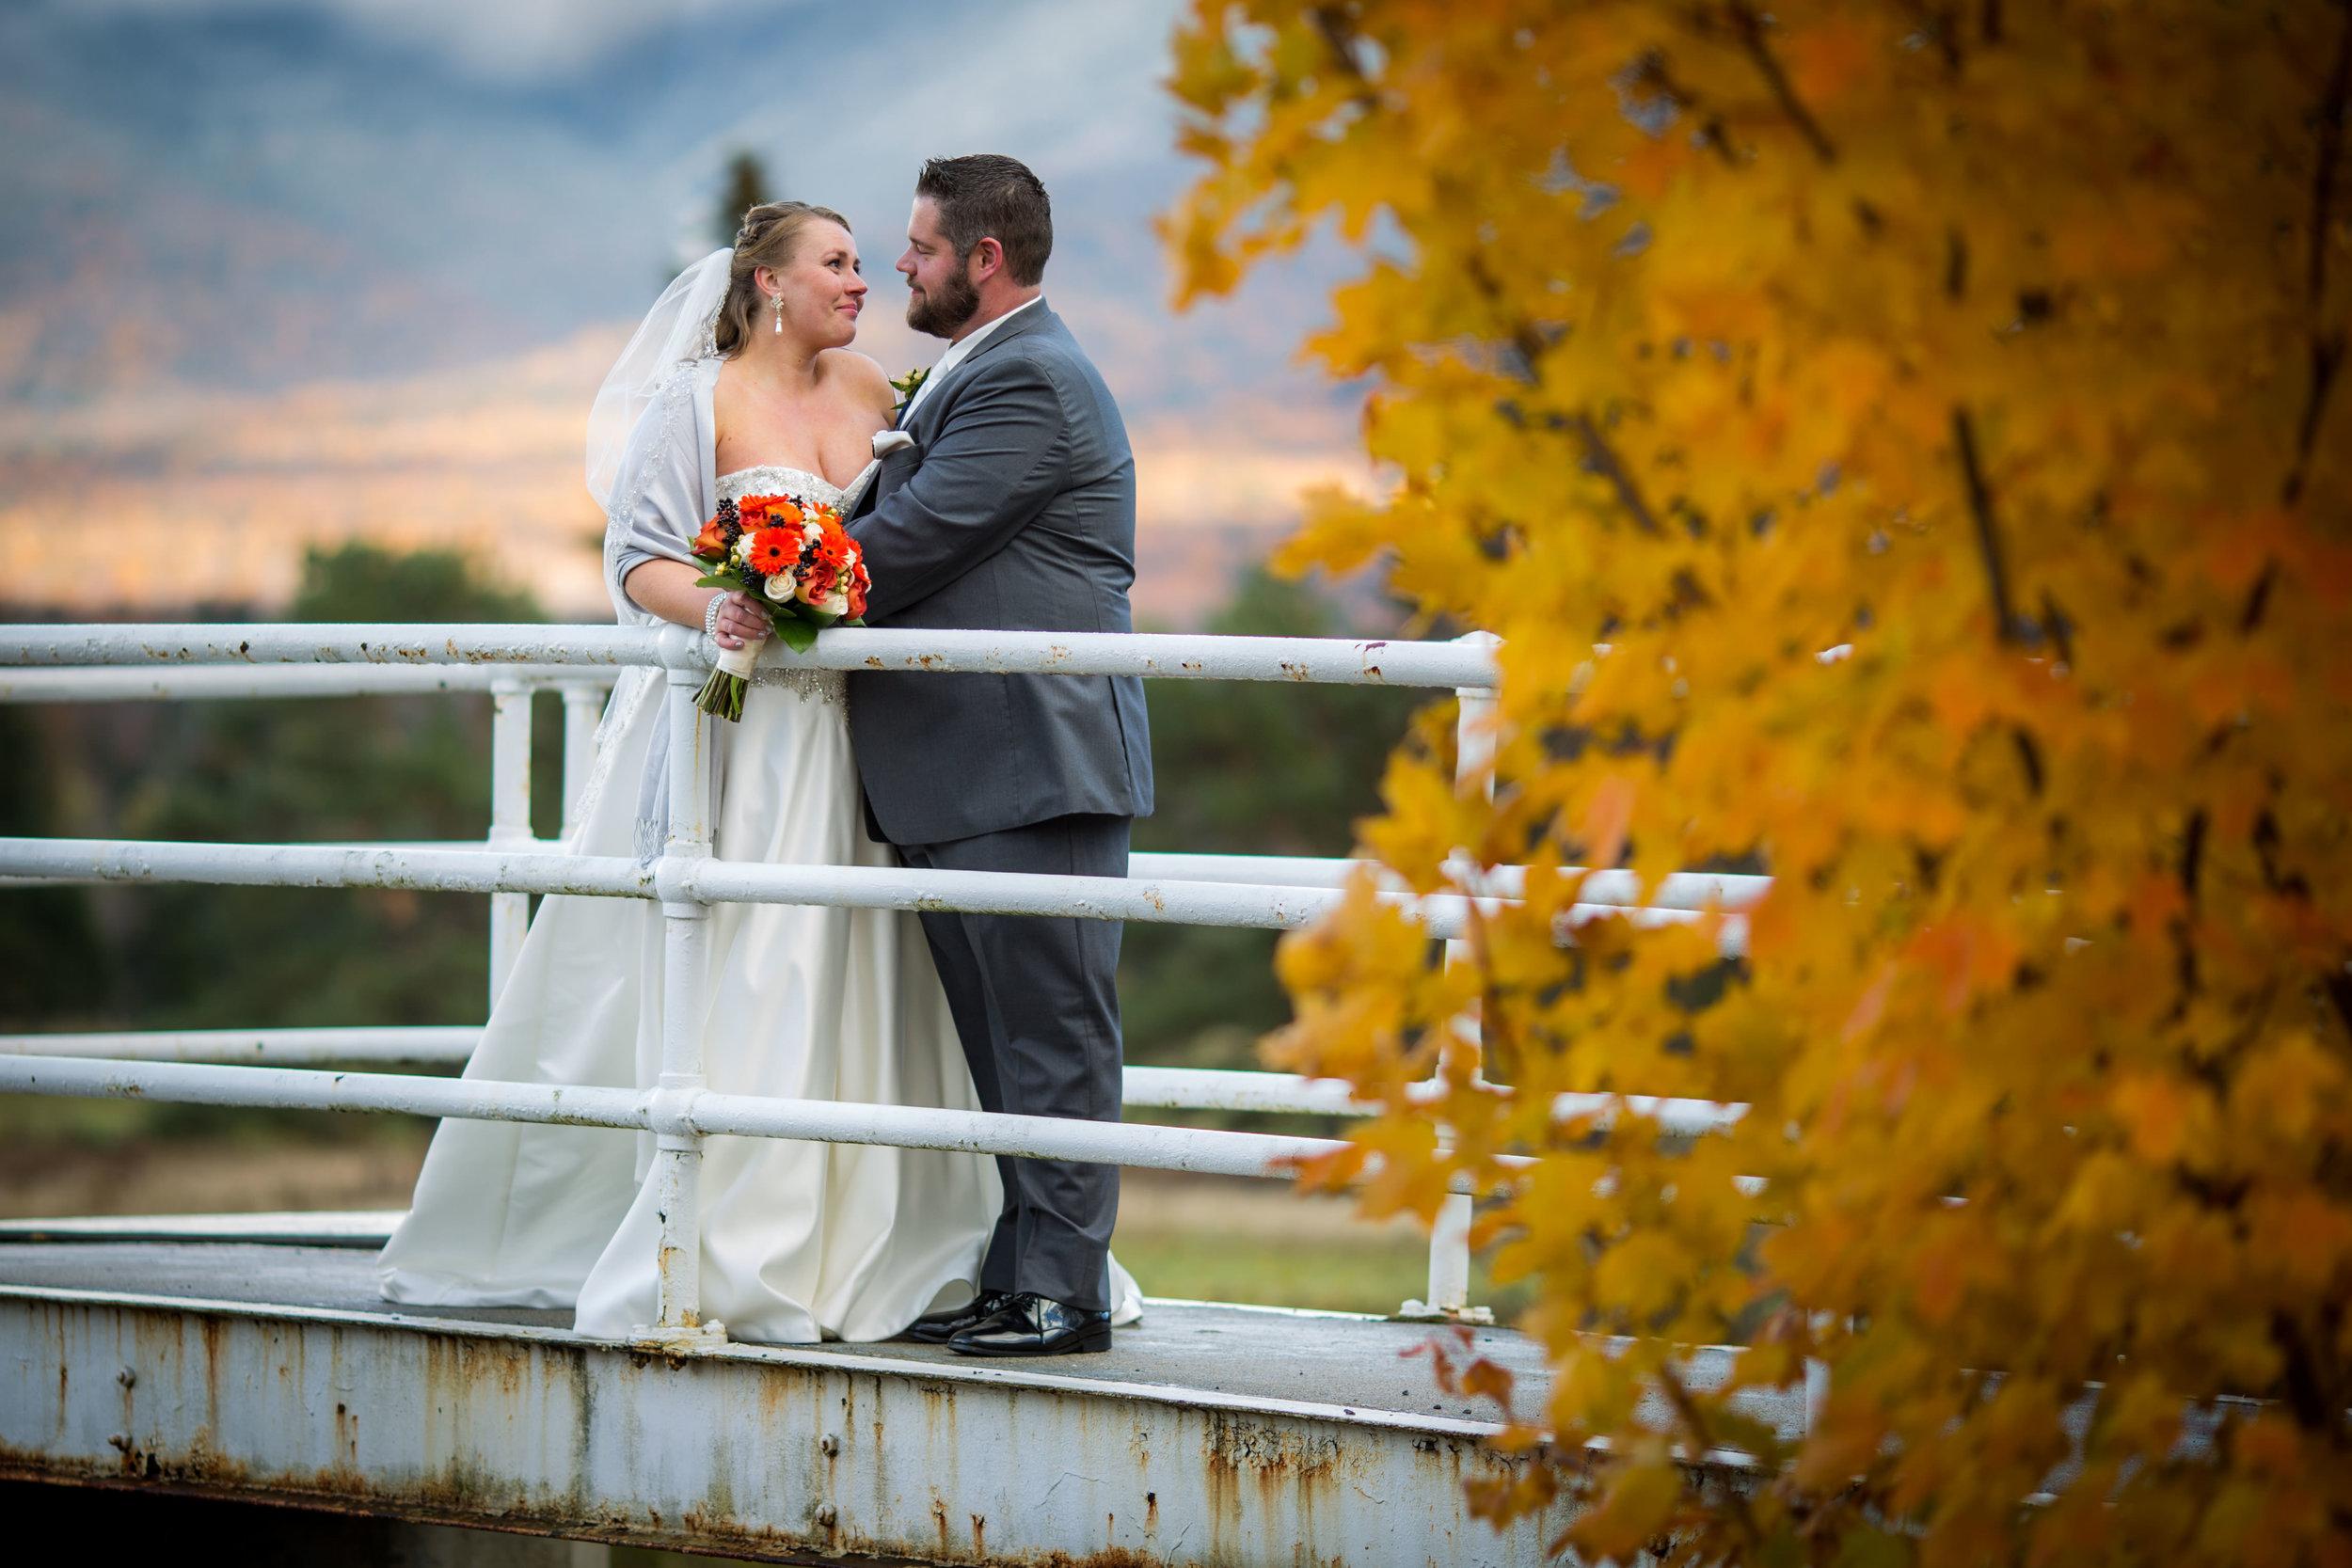 mount-washington-wedding-photography-332.jpg